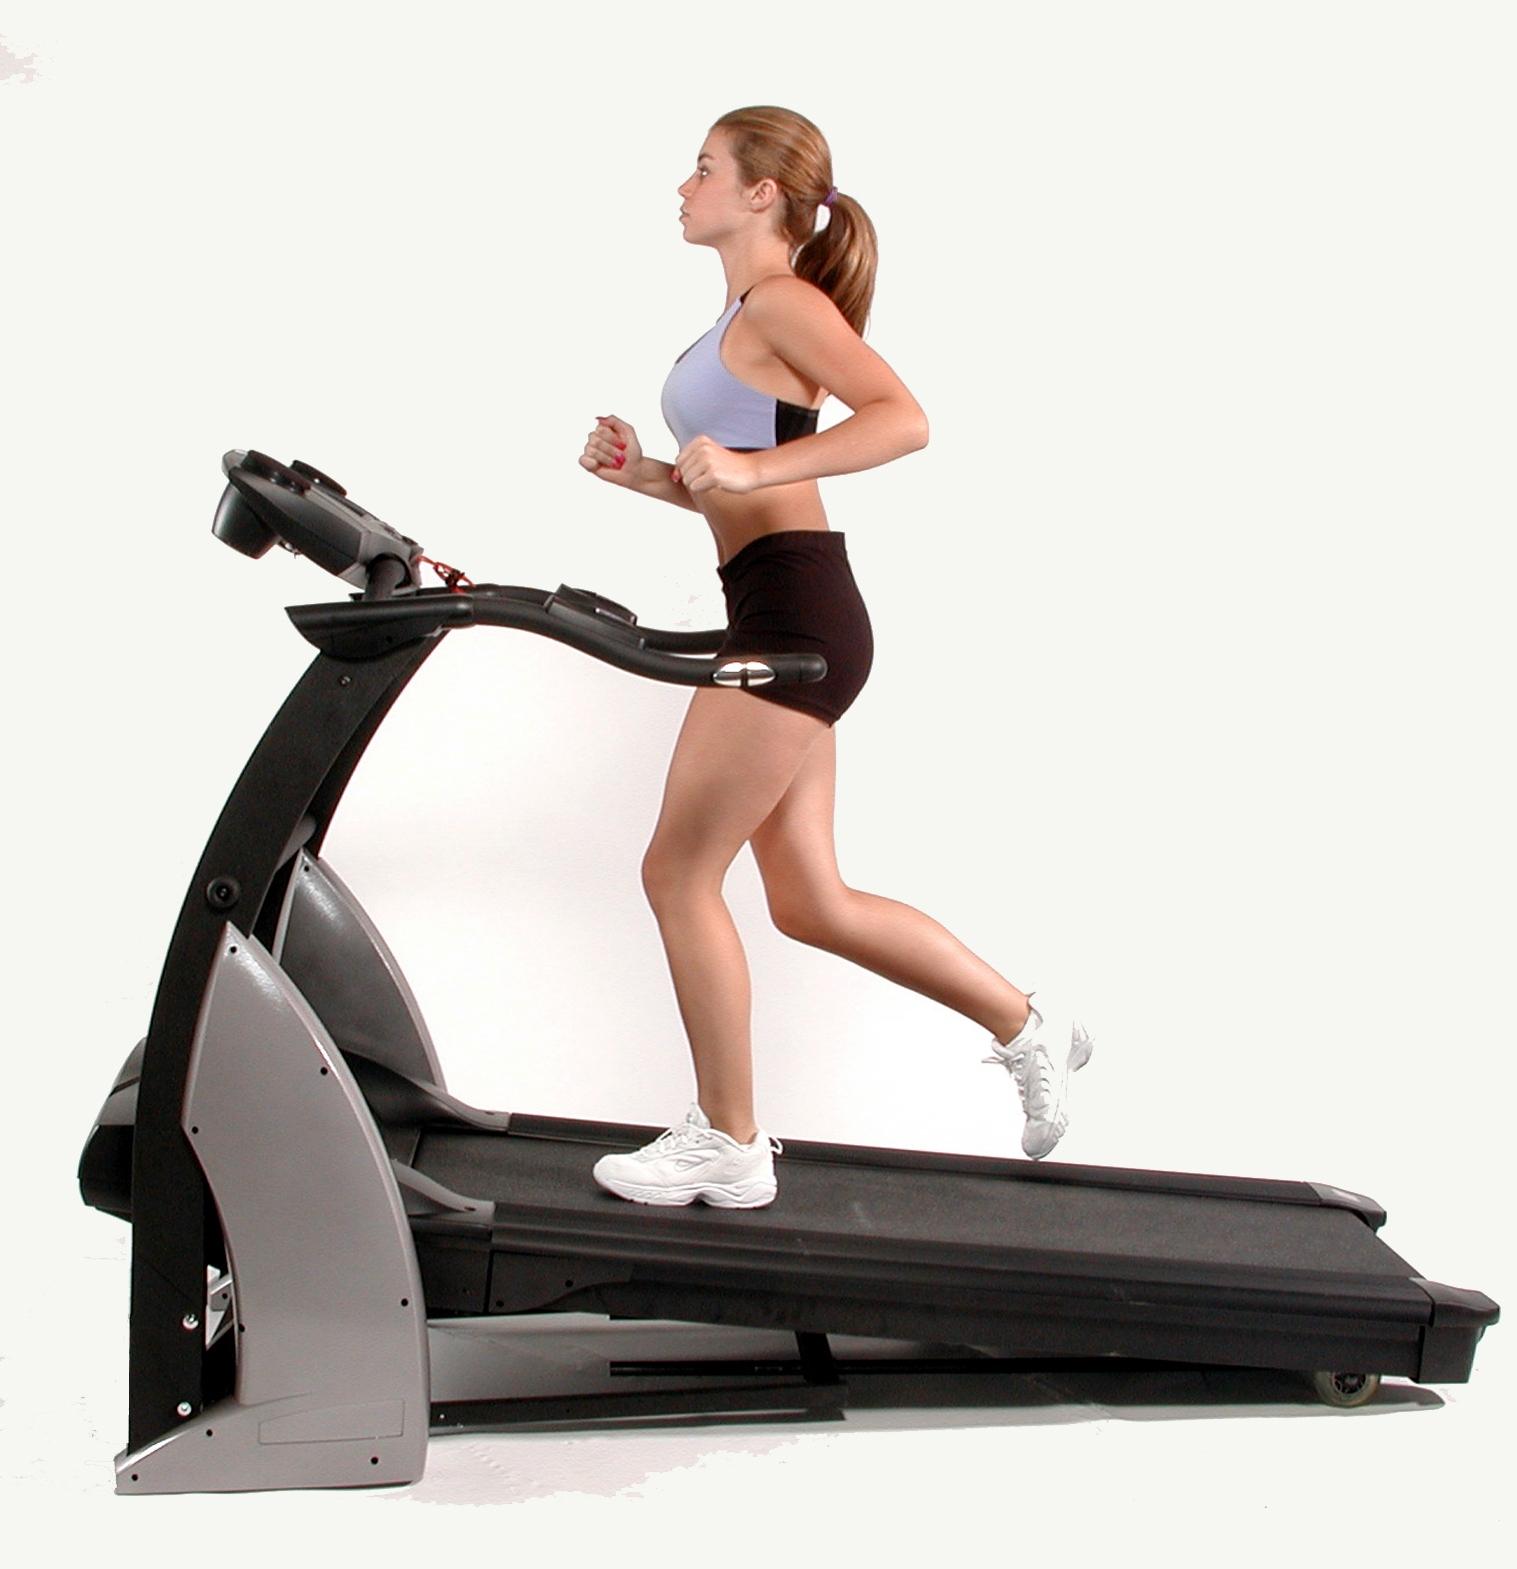 Top 3 Best Treadmills Under 1000 Dollars – Reviewed (2017)